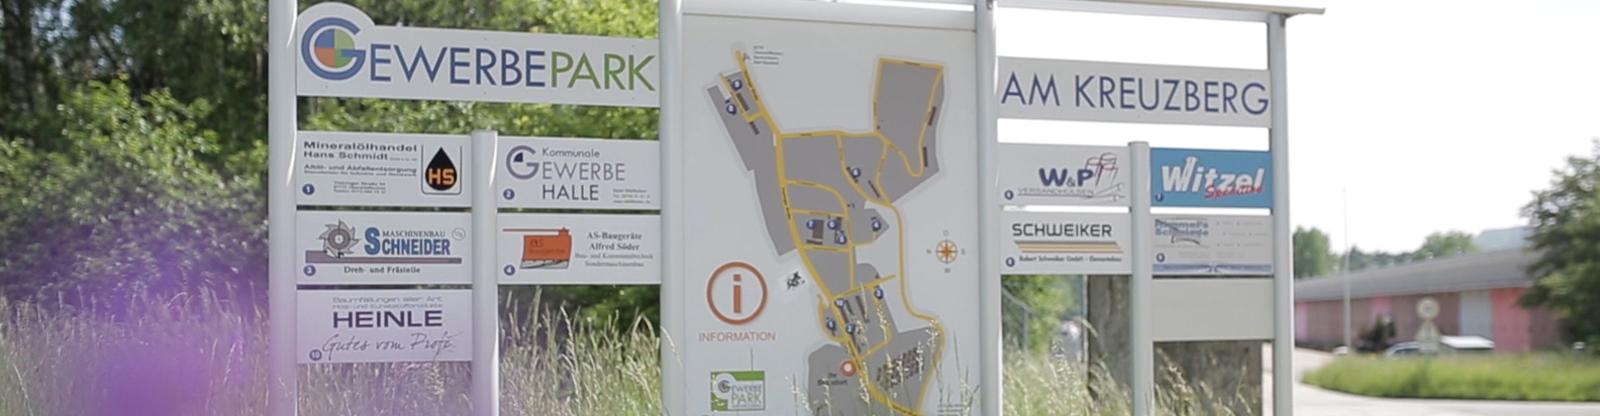 Gewerbepark Kreuzberg